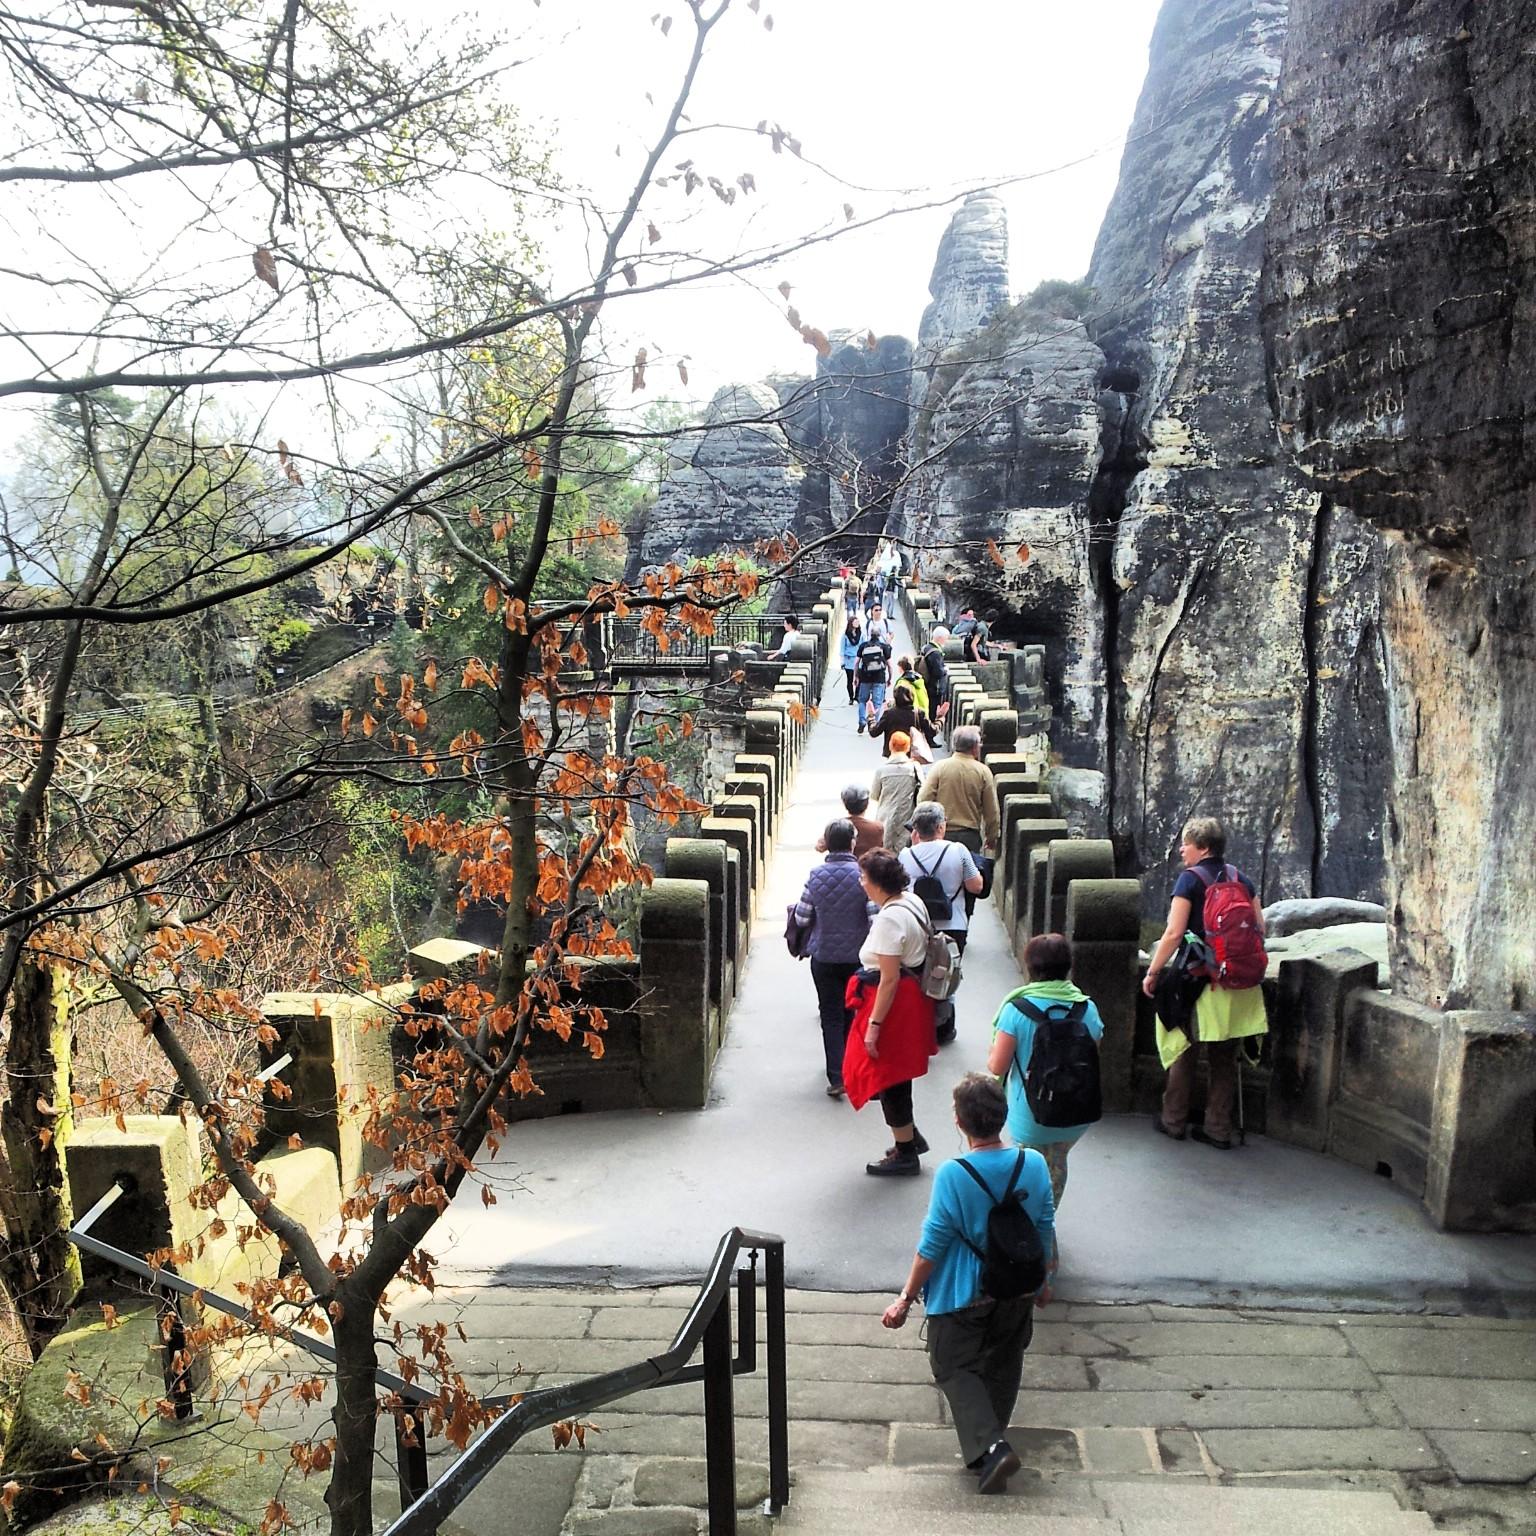 Hiking in the Czech – Saxon Switzerland